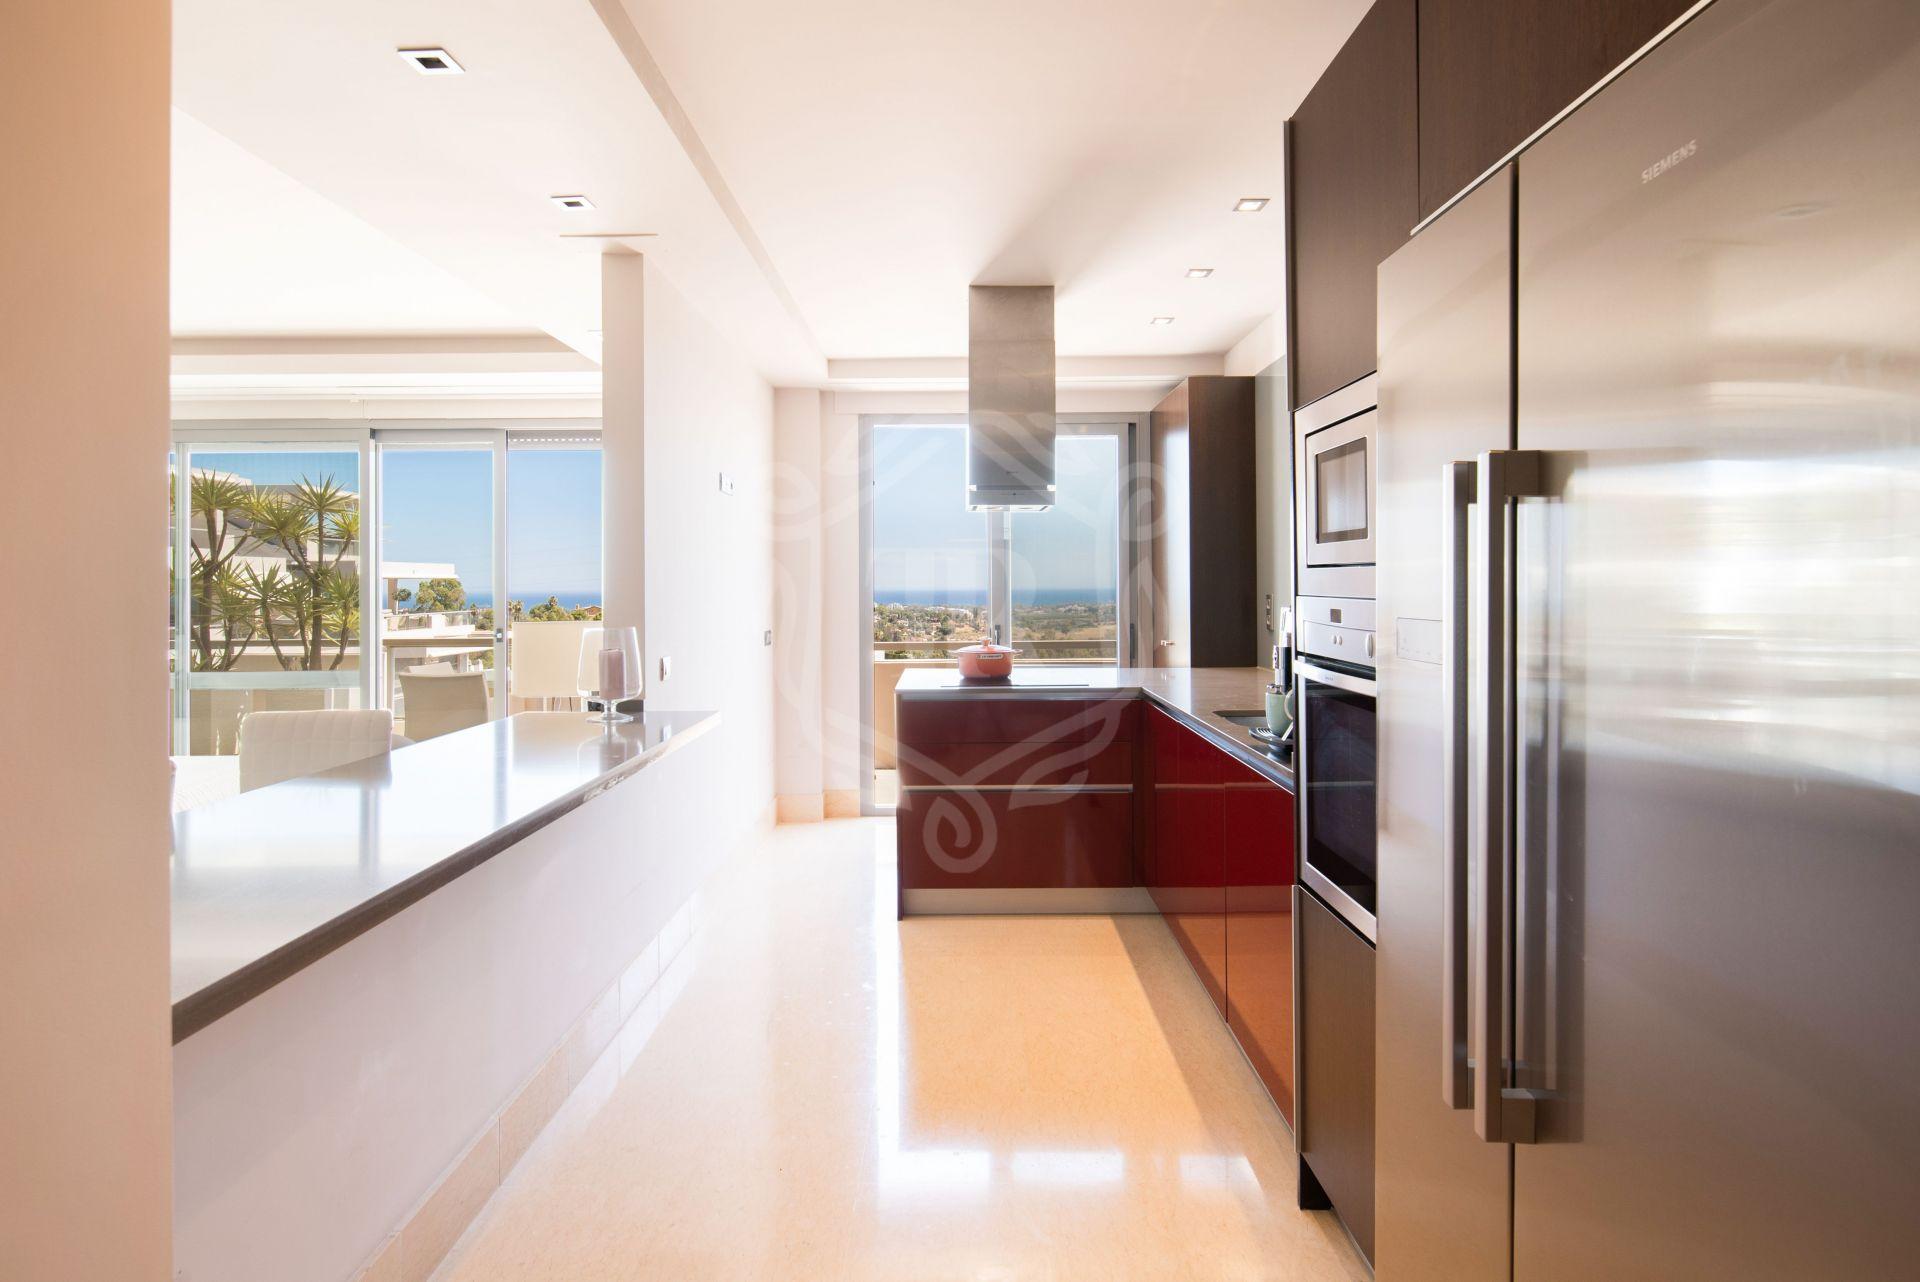 Penthouse for sale in Los Arrayanes Golf, Benahavis